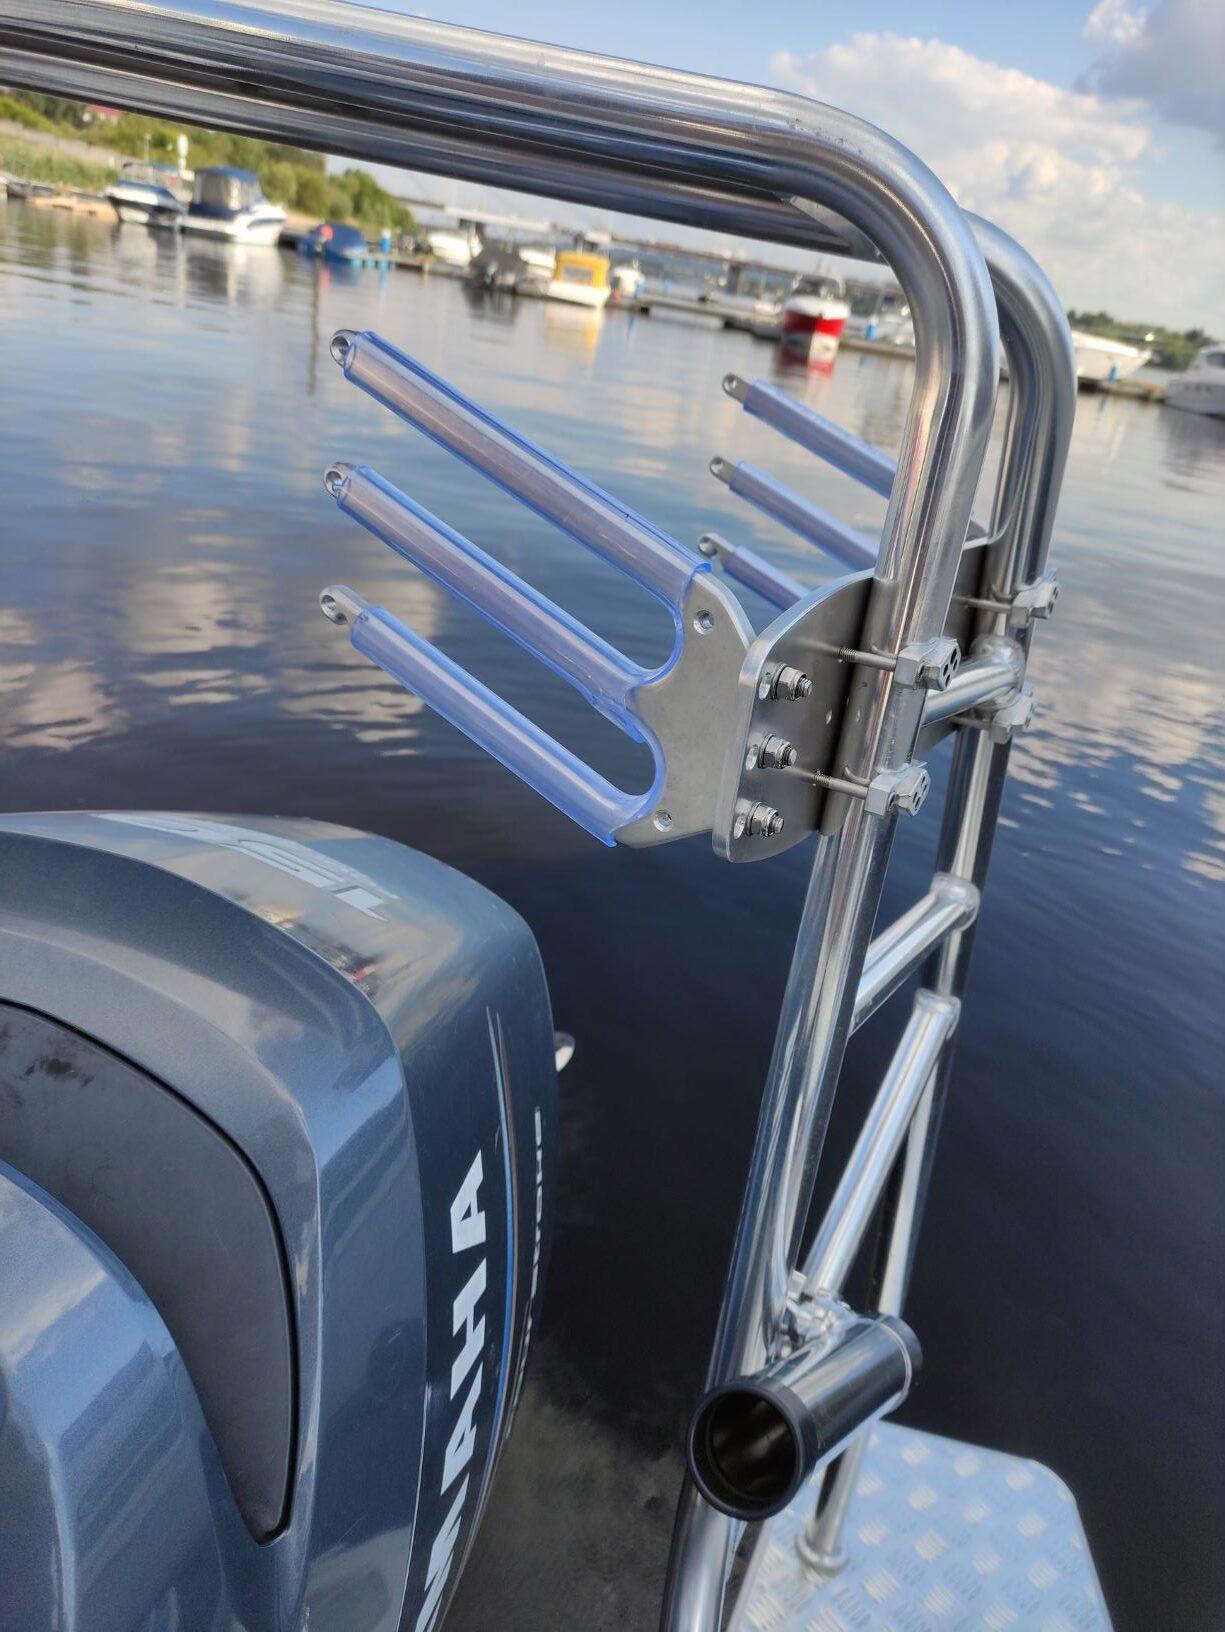 Кронштейн для водных лыж, вейкборда (Wakeboard Rack)